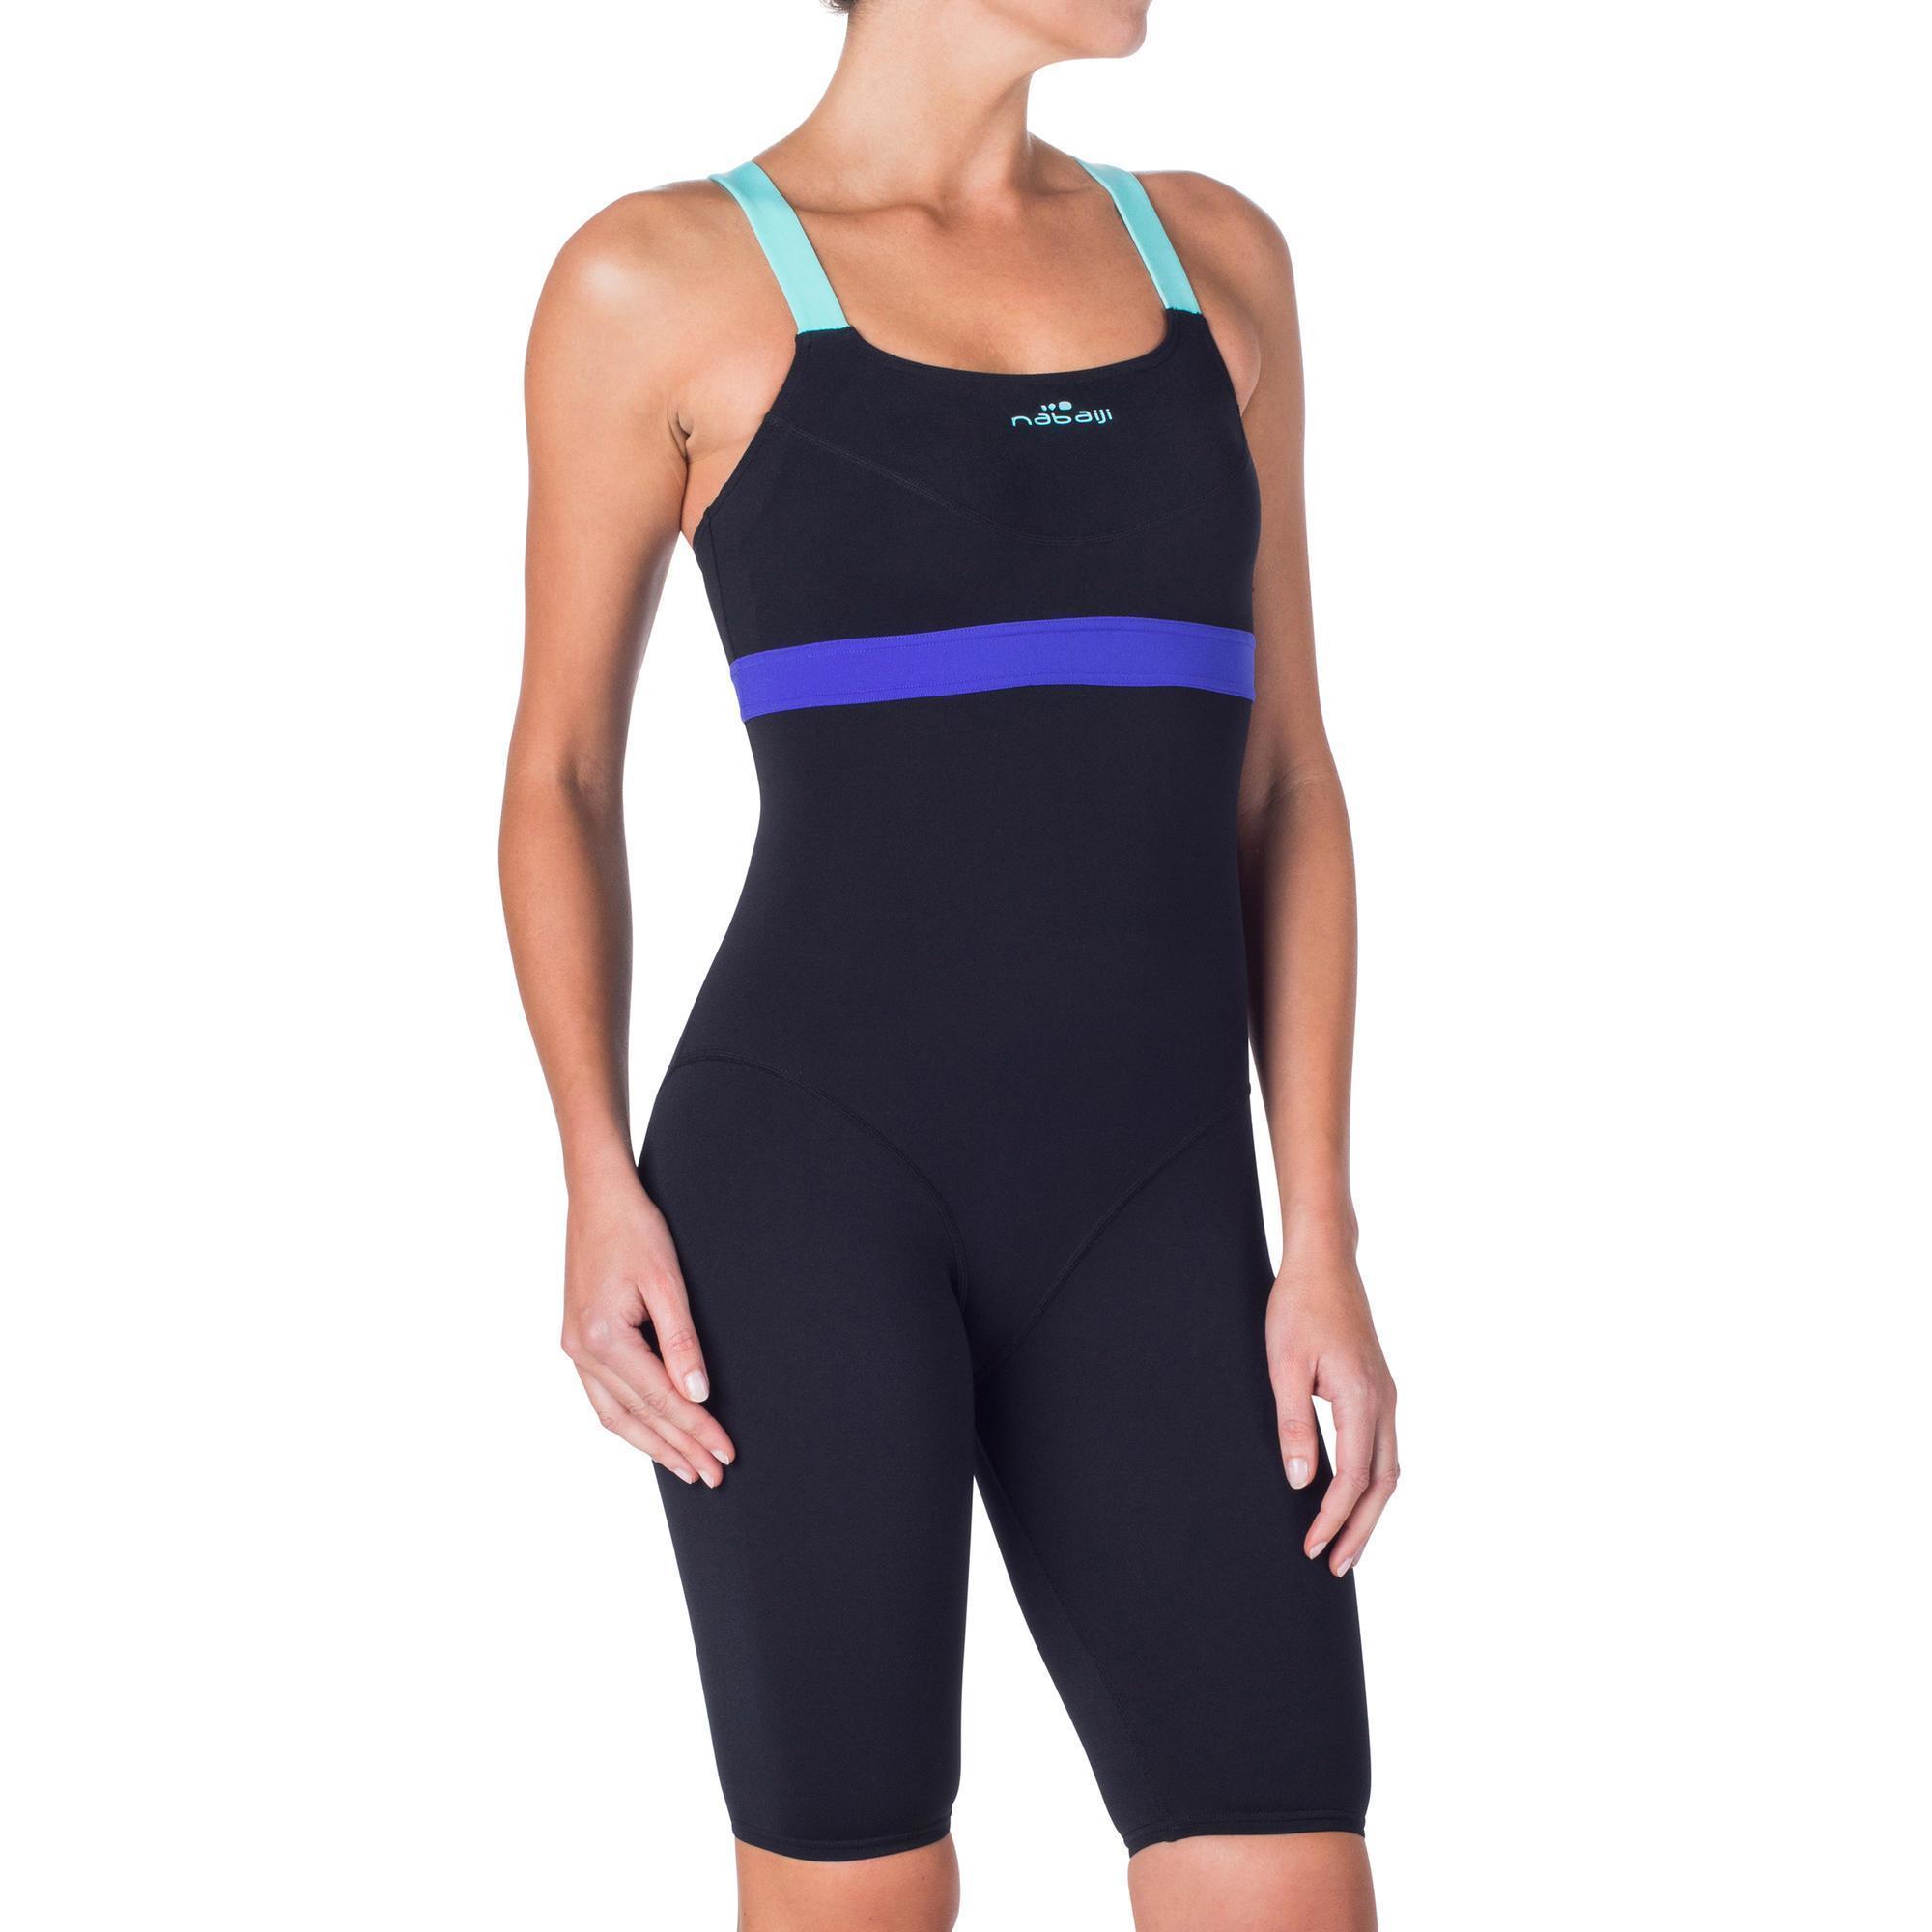 Anna Women S Chlorine Resistant Aquabiking Jammer Swimsuit